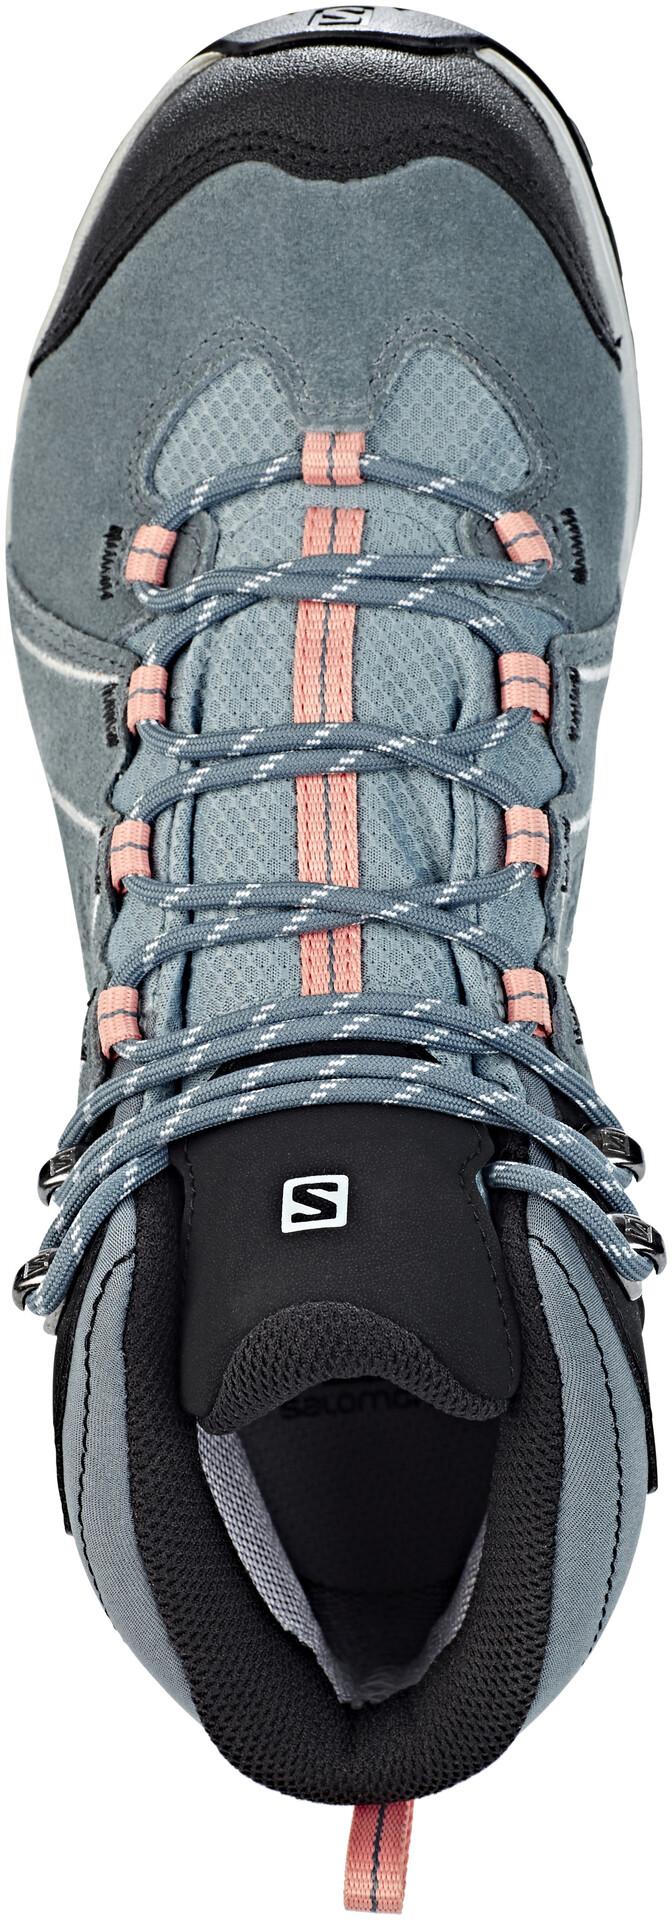 Salomon Ellipse 2 Mid LTR GTX Shoes Damen leadstormy weathercoral almond